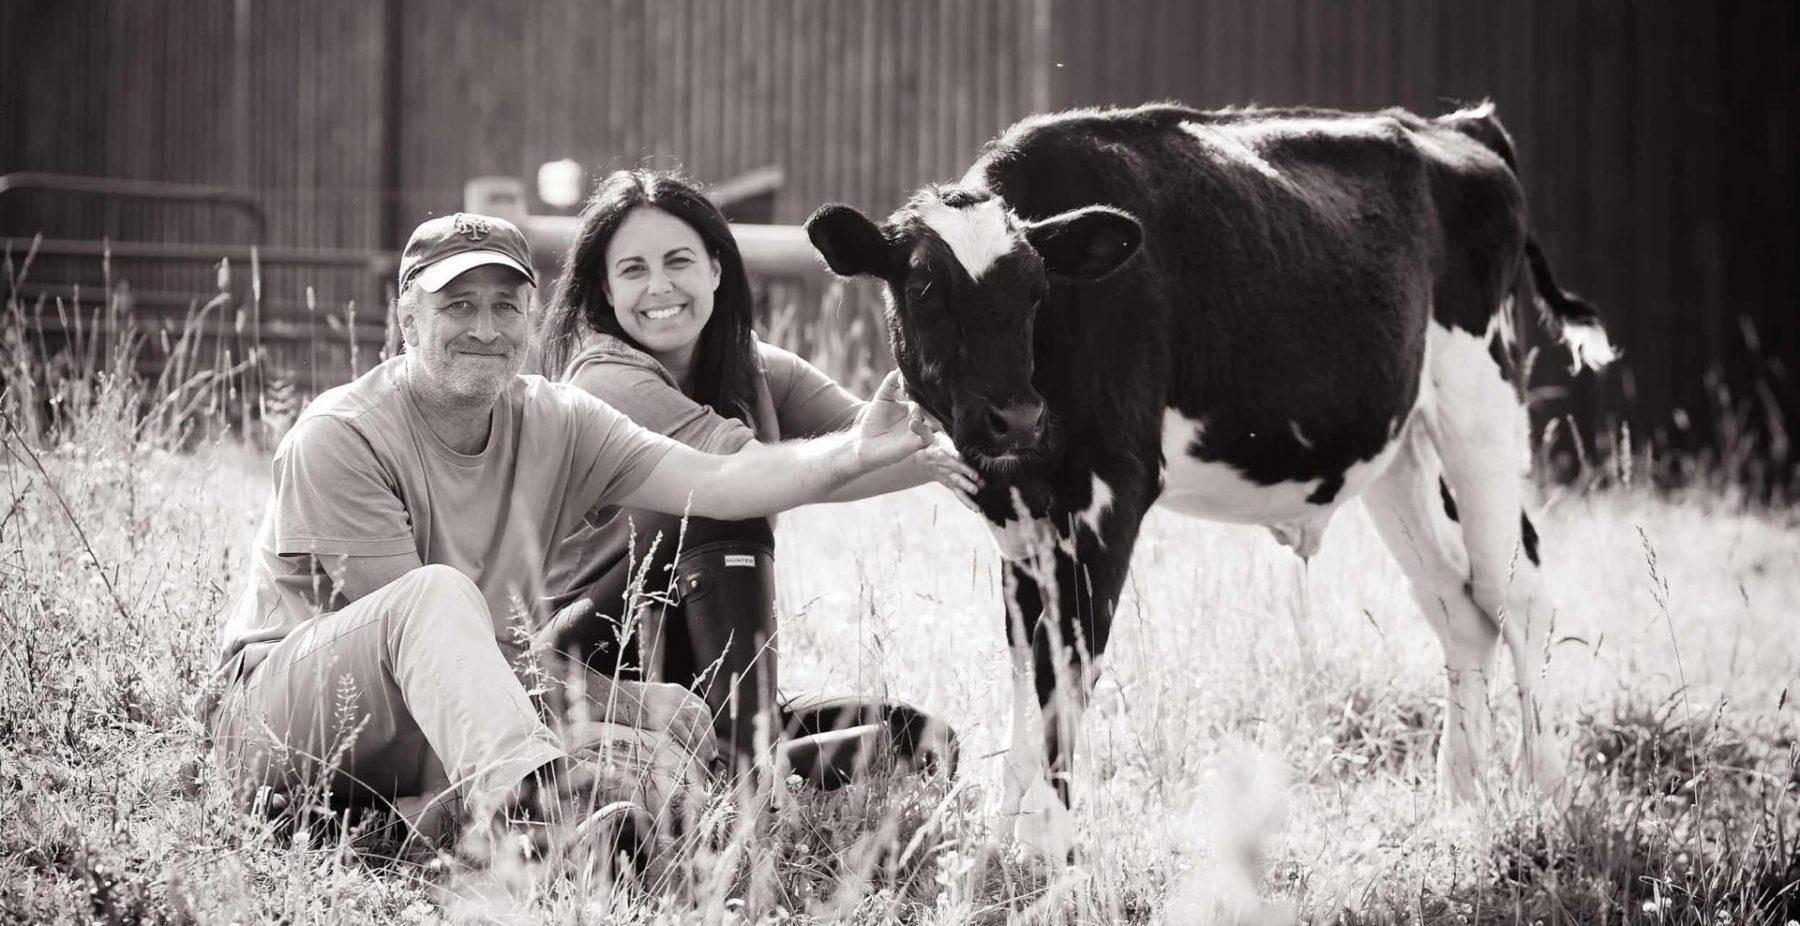 Jon and Tracey Stewart at Farm Sanctuary. USA